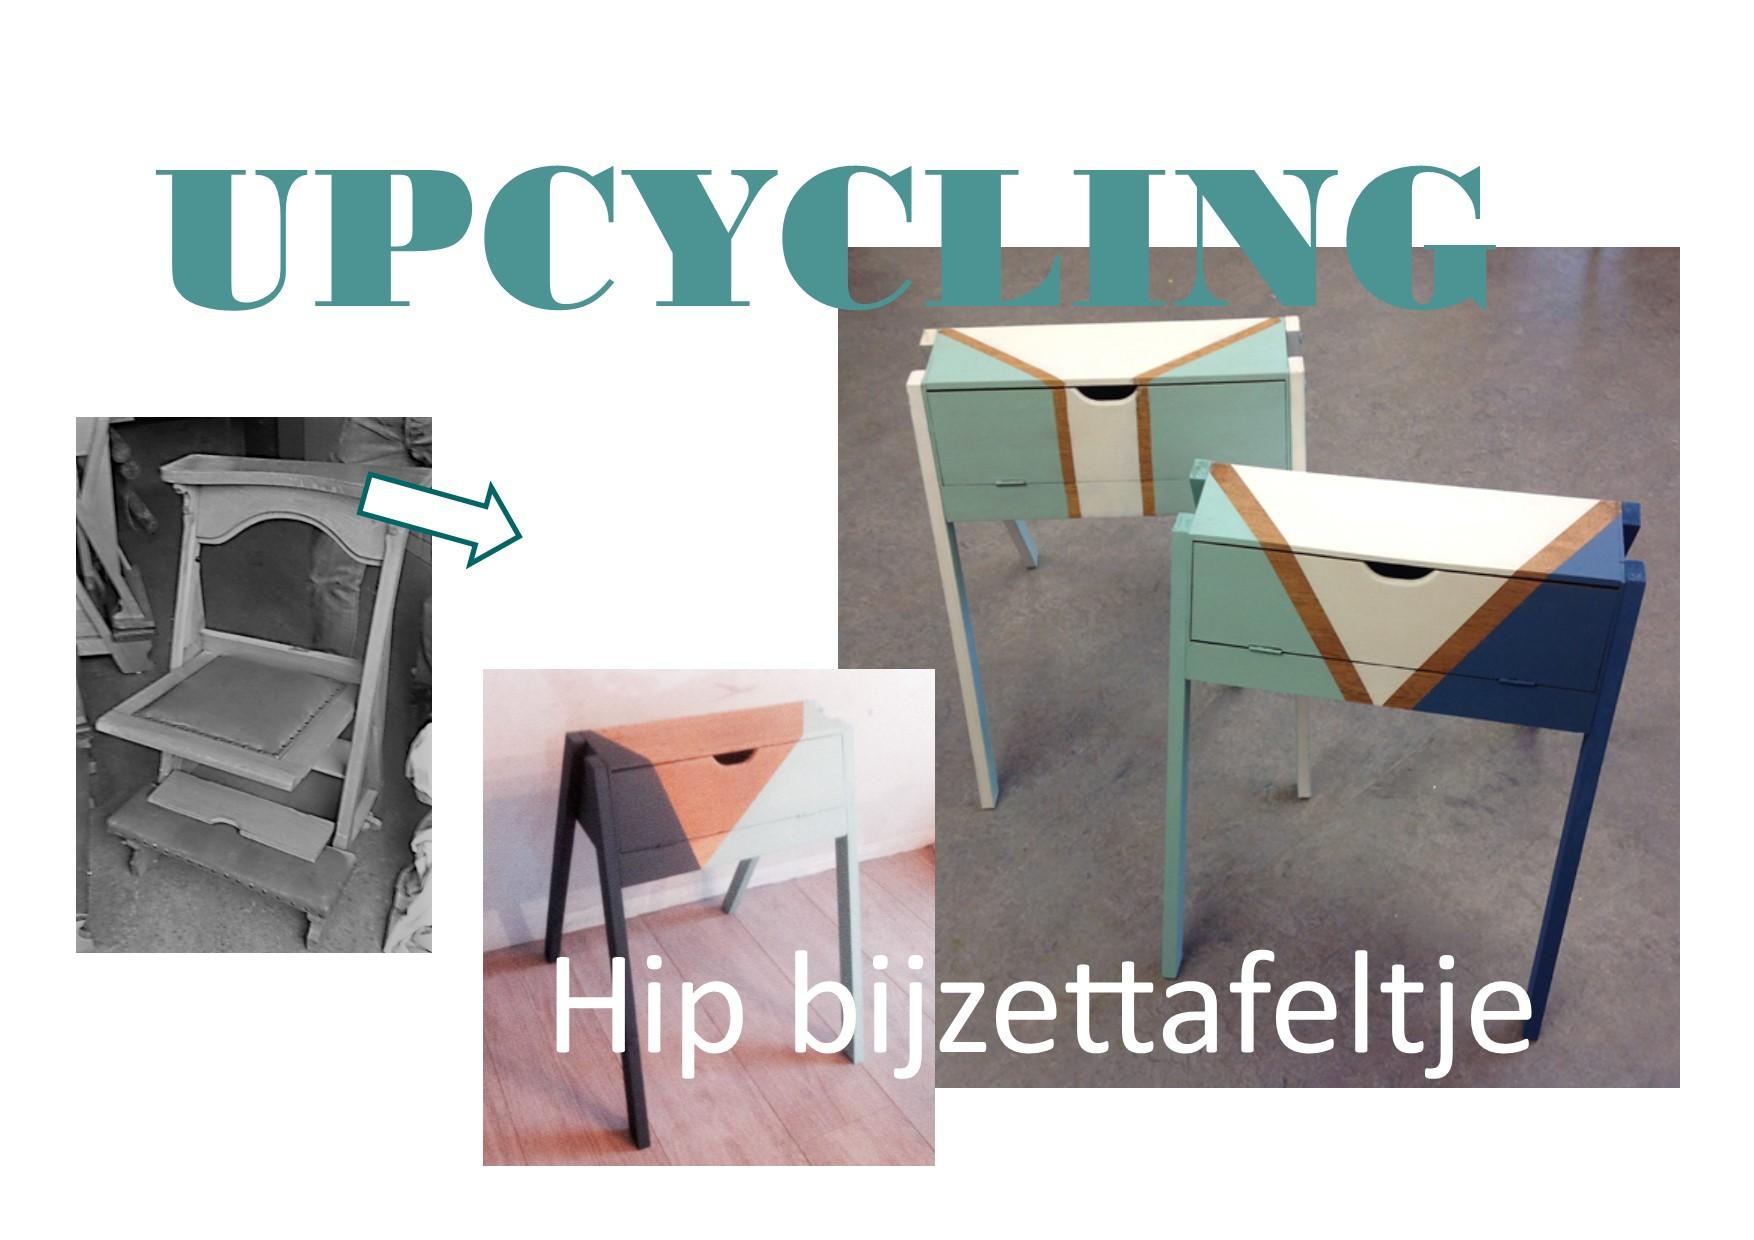 UpcyclingWorkshop: oude Kerkstoel wordt Hip tafeltje